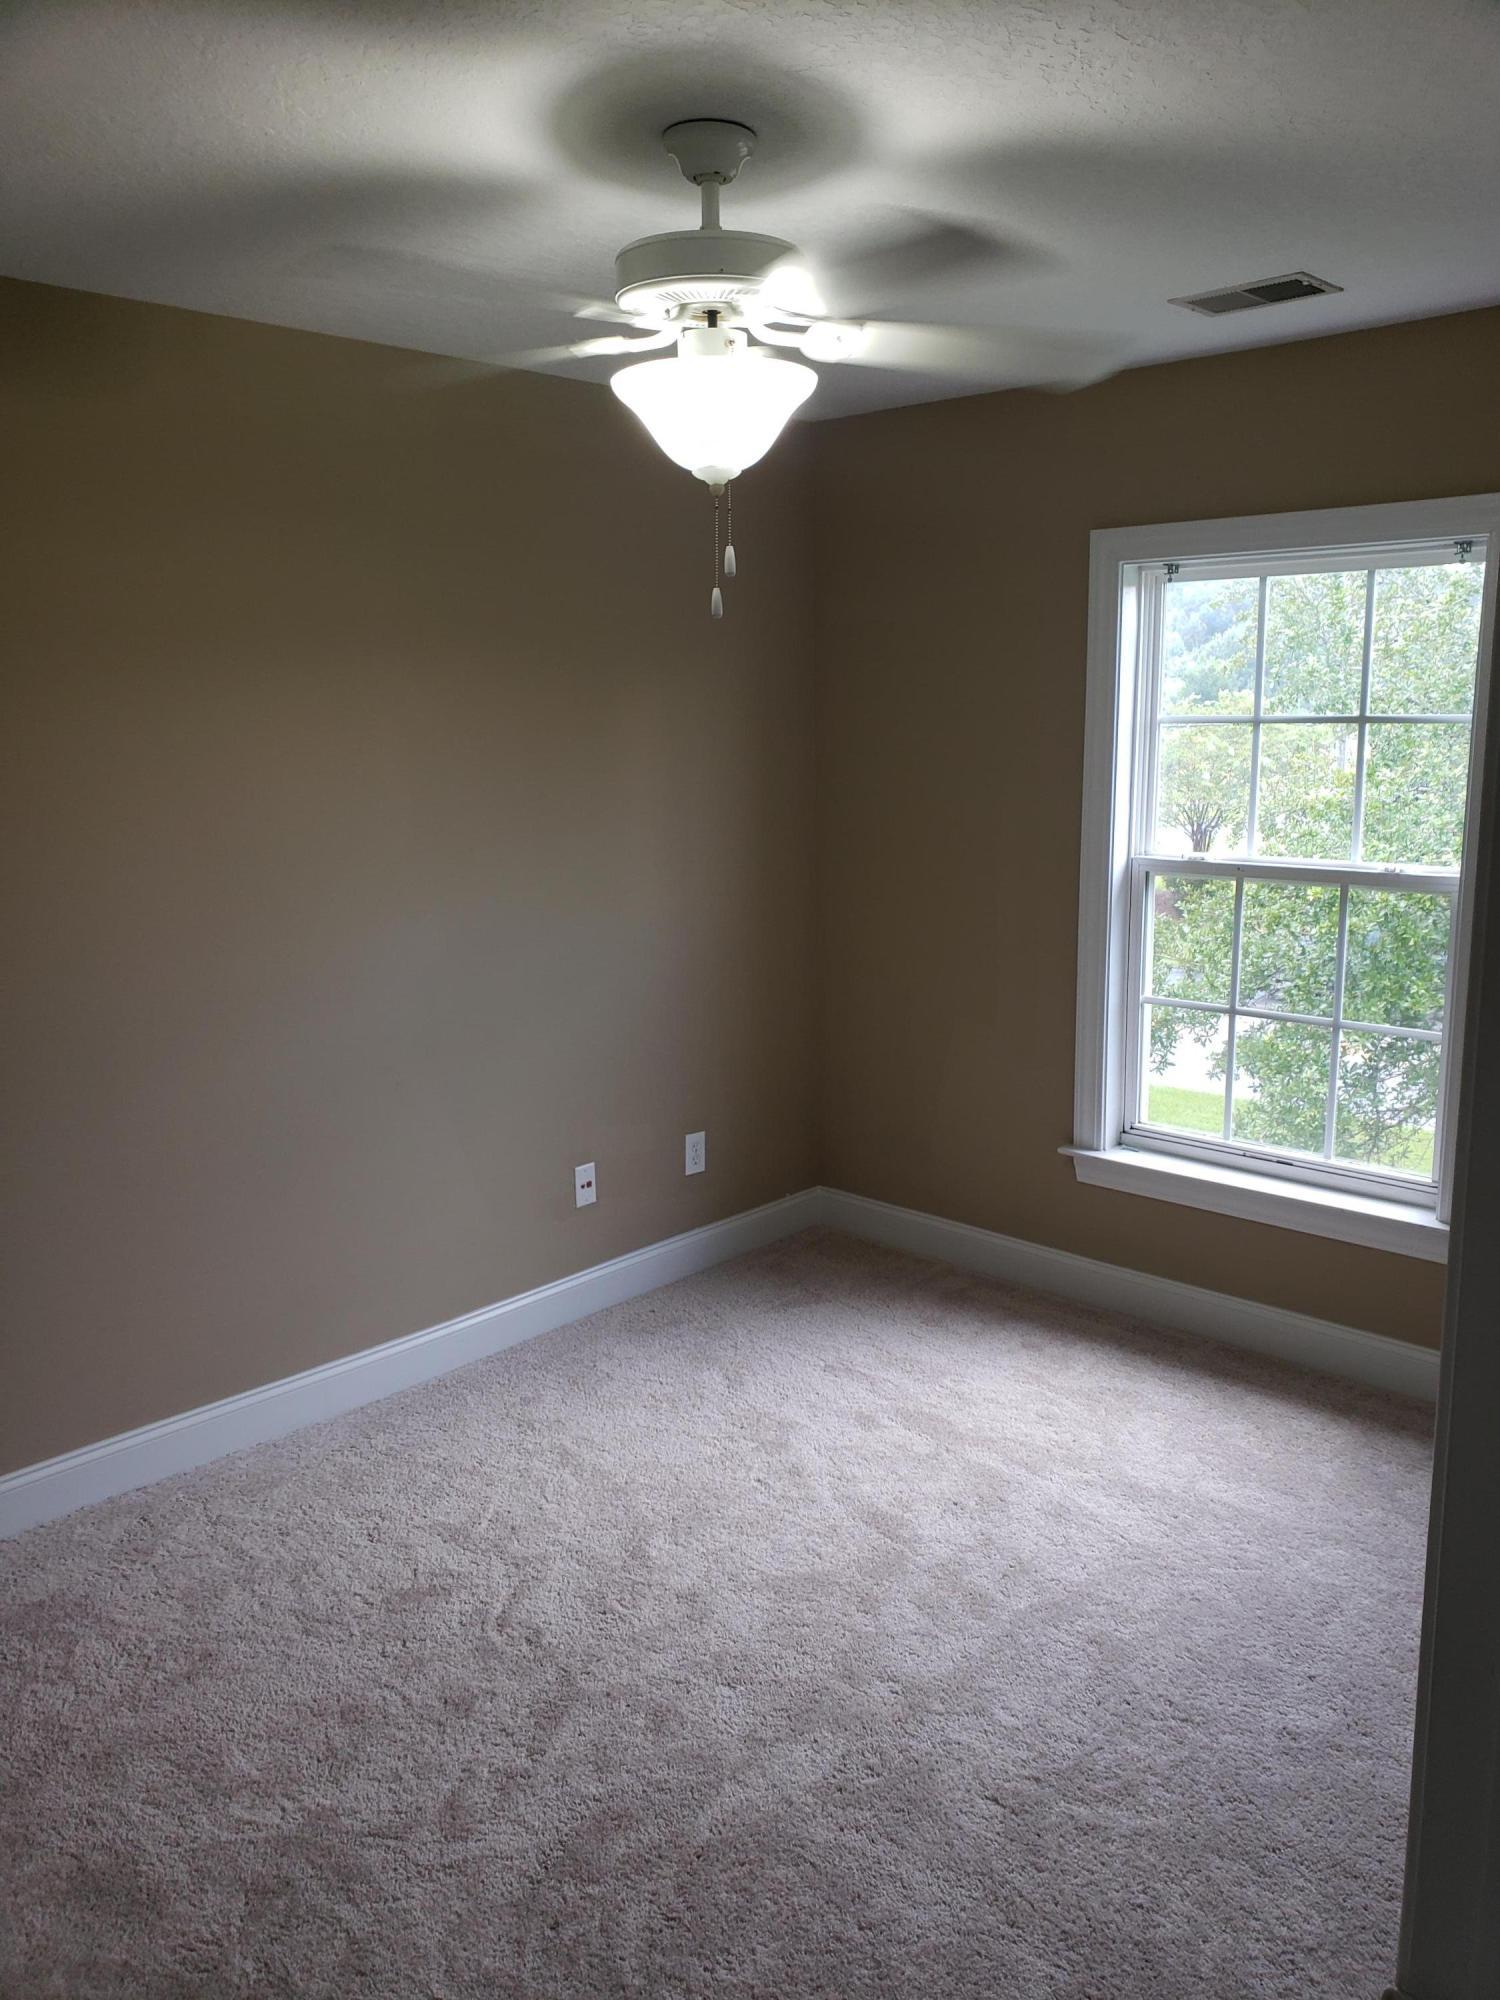 Montague Pointe Homes For Sale - 100 Gavins, Goose Creek, SC - 8